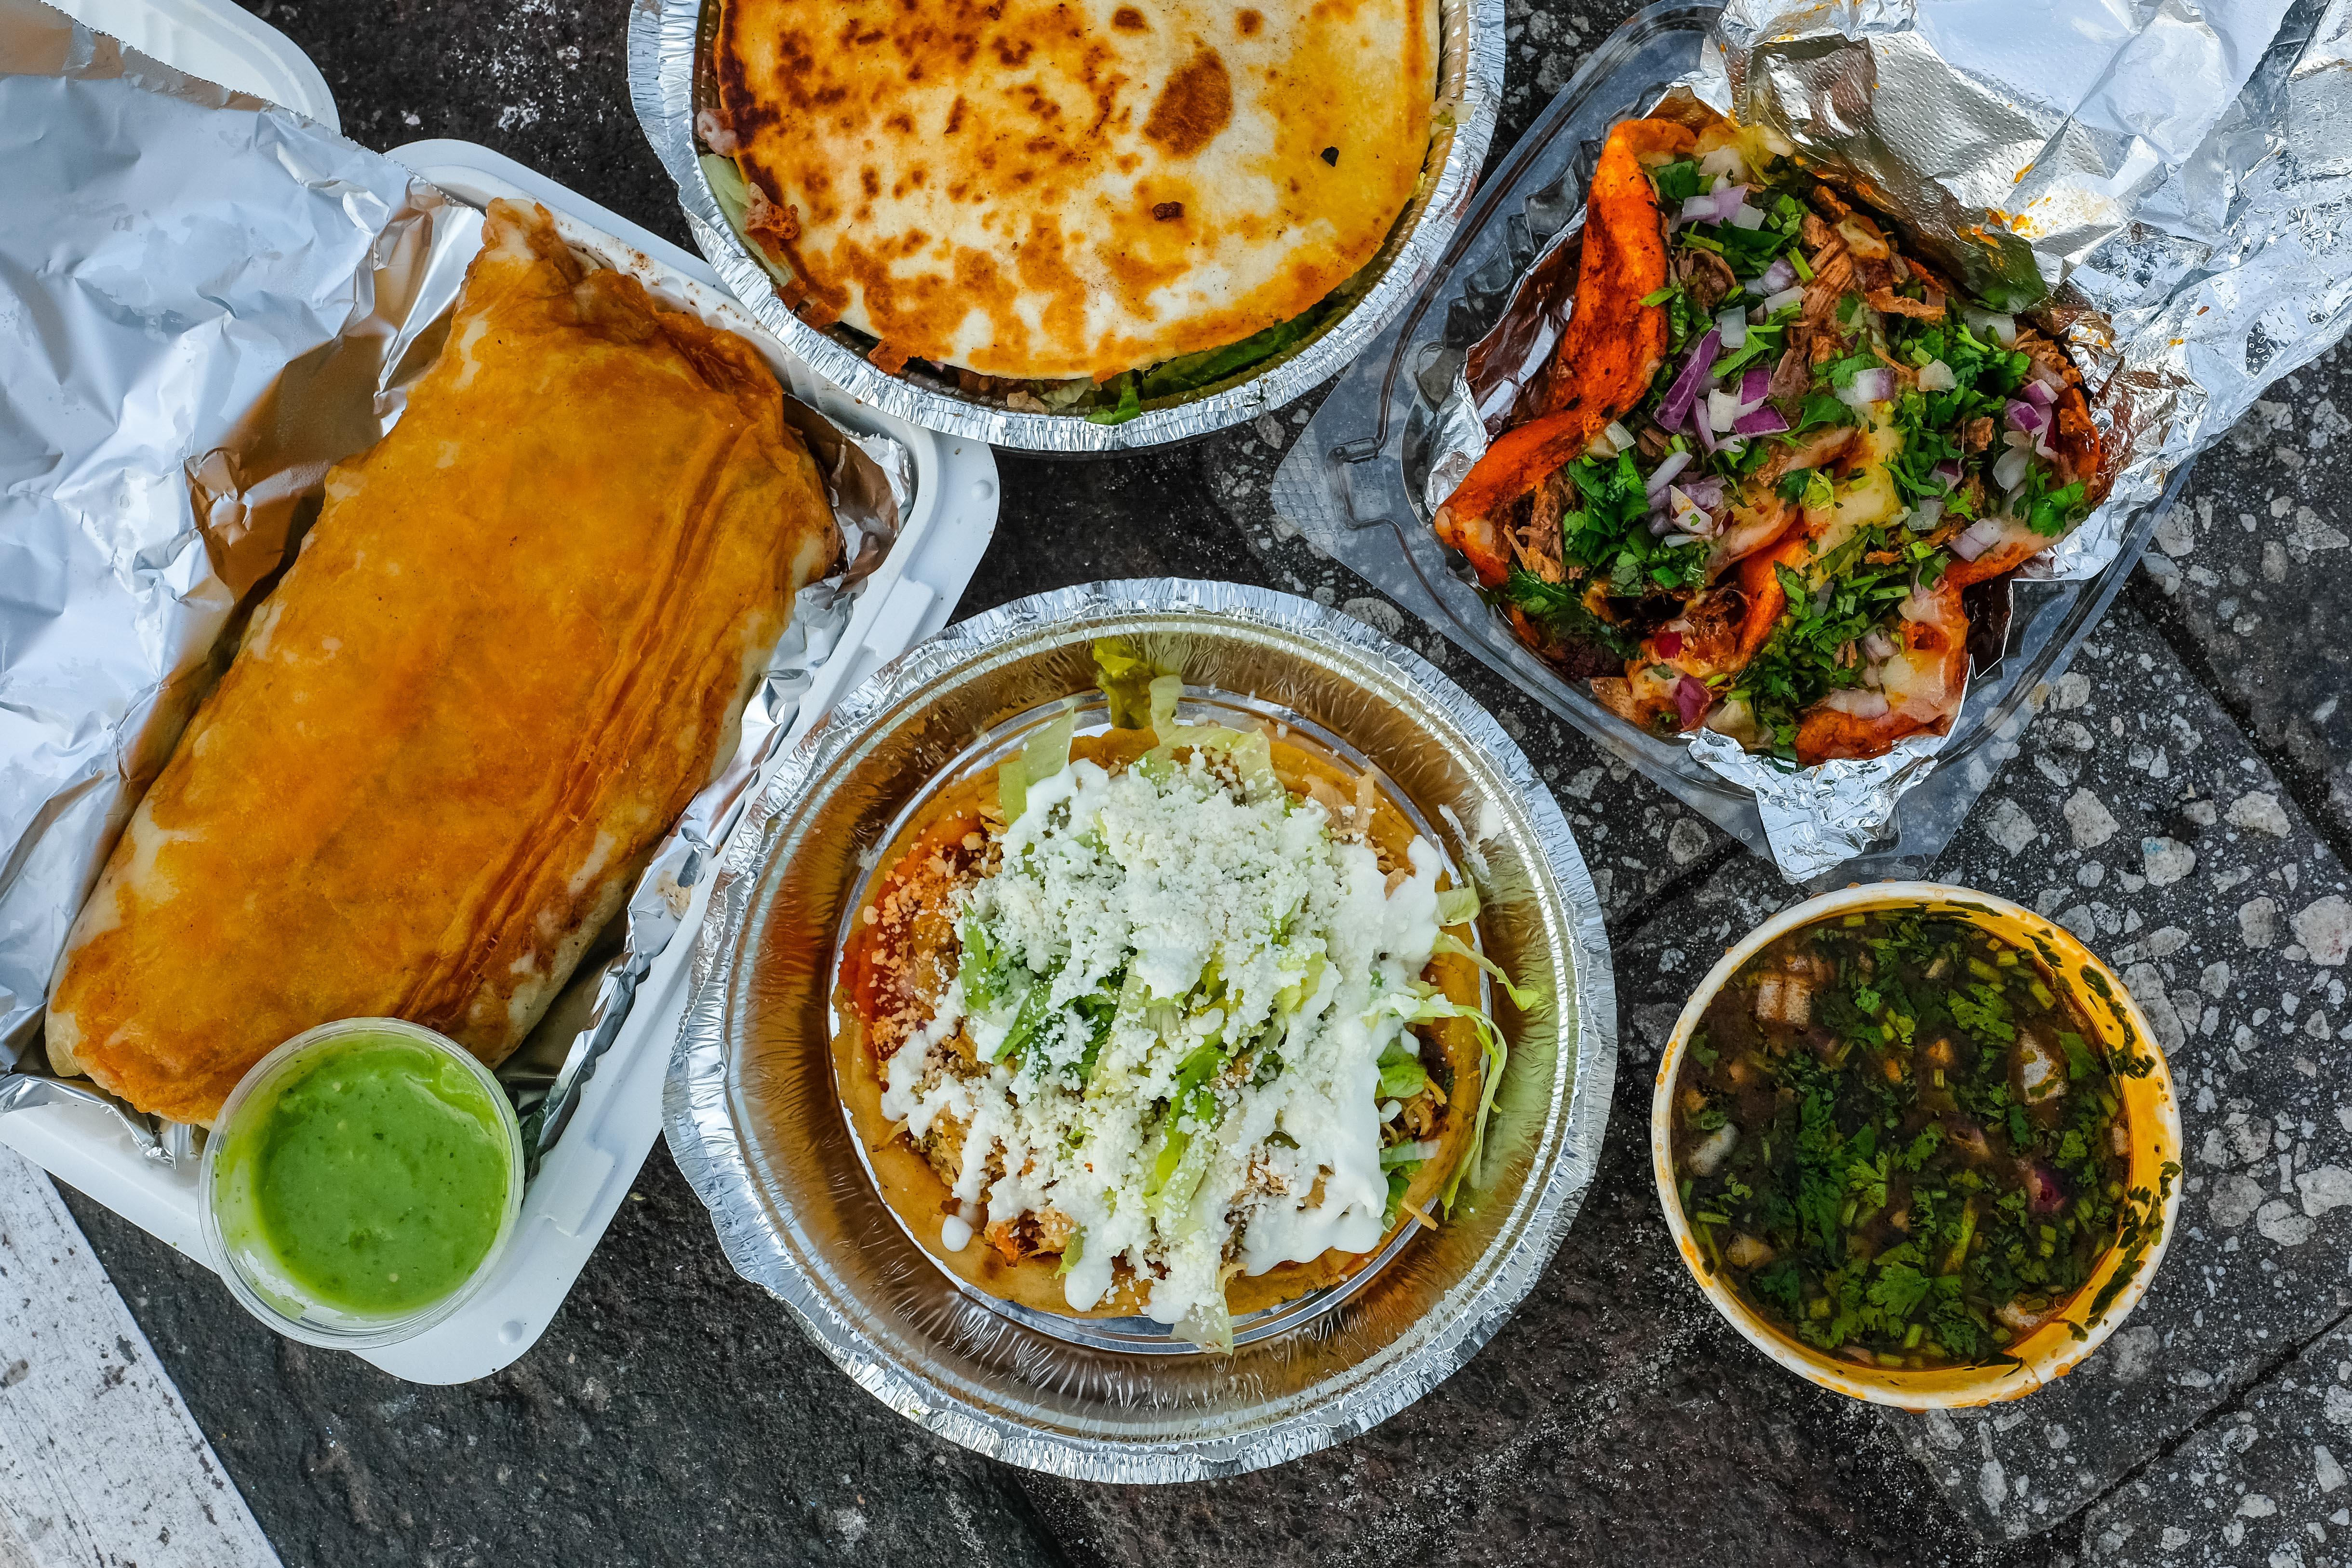 New Hidden Taco Shop Slinging First-Rate Birria In Bushwick